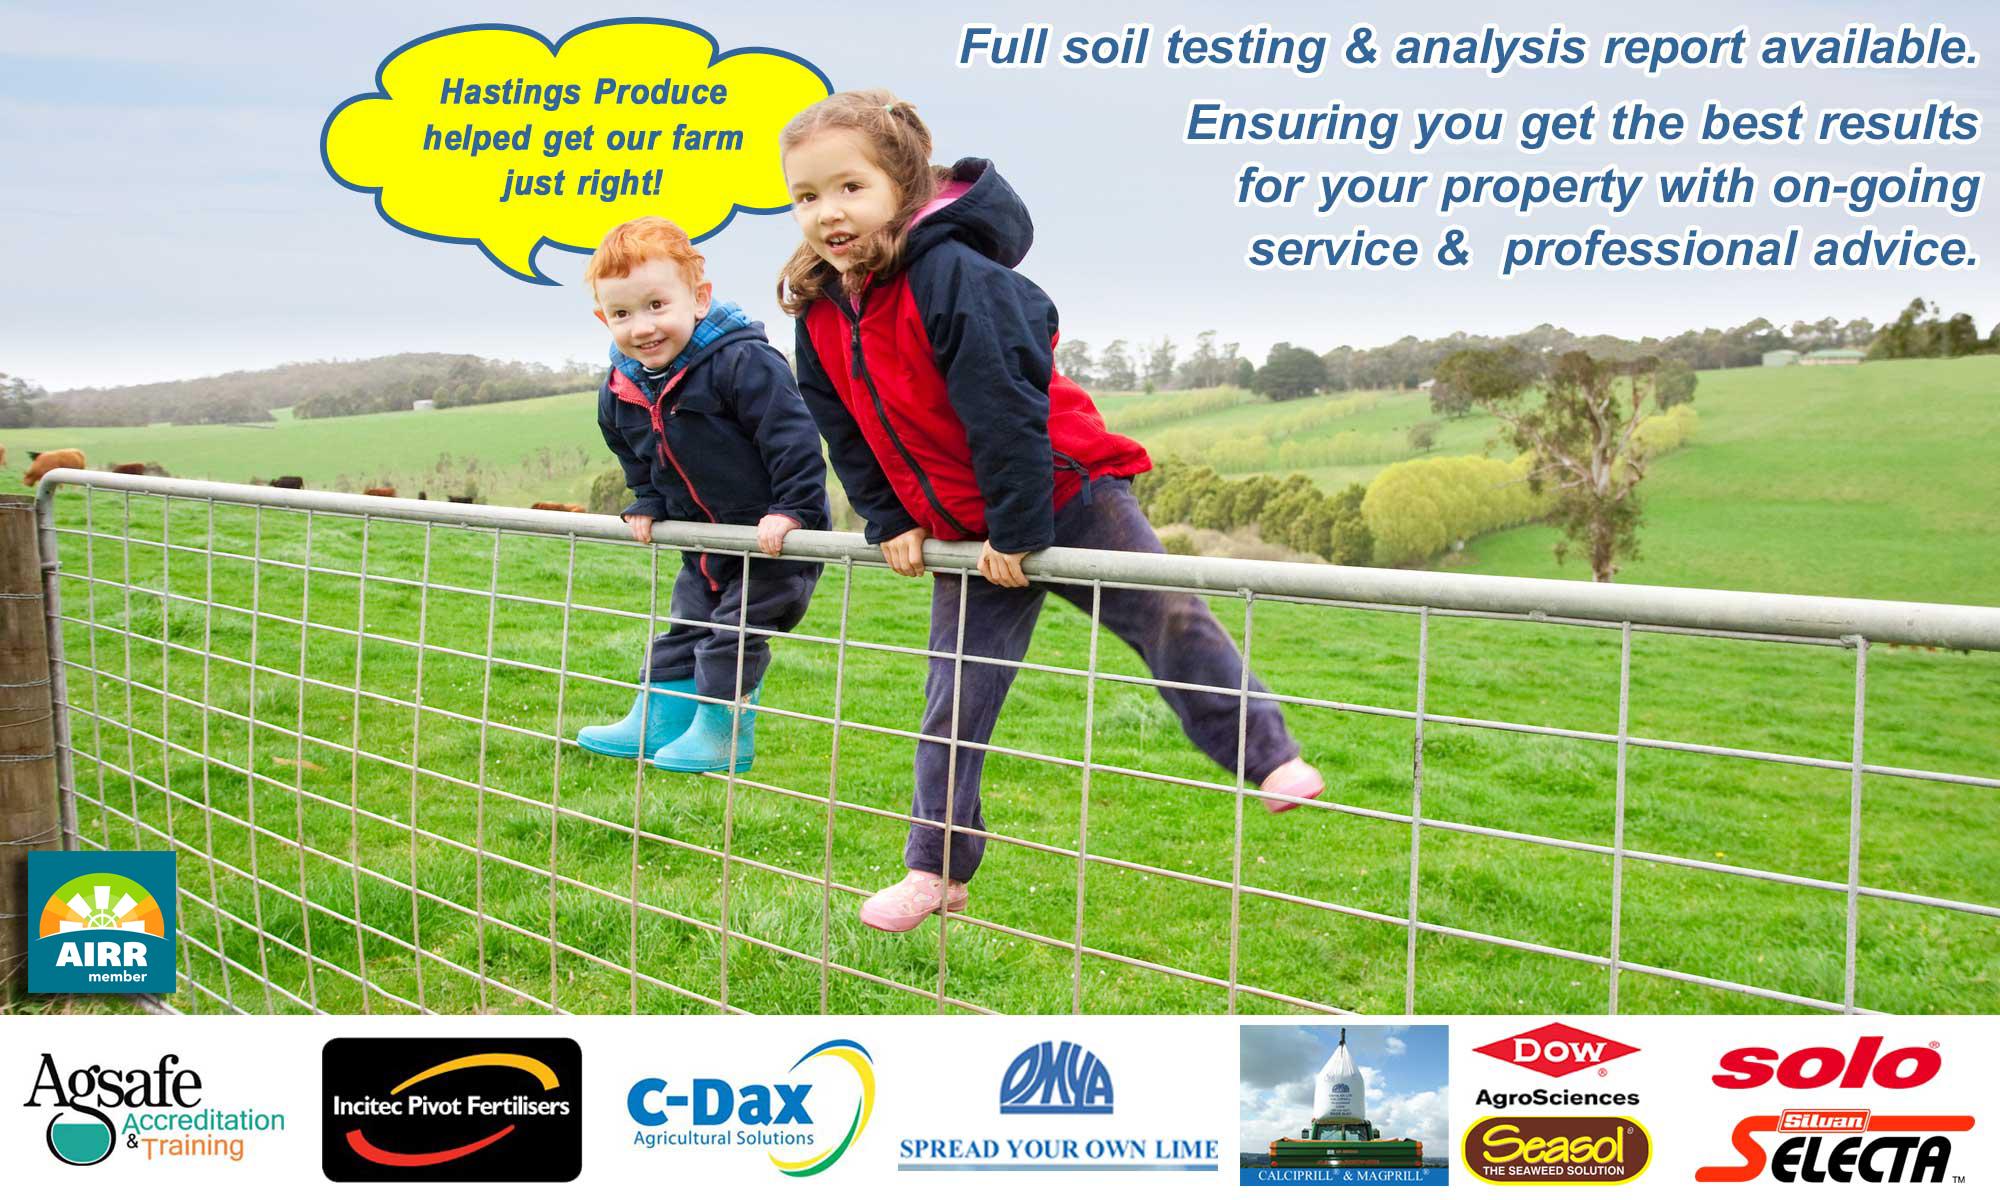 Hastings Produce - Kids on Farm Gate and Farm Fence